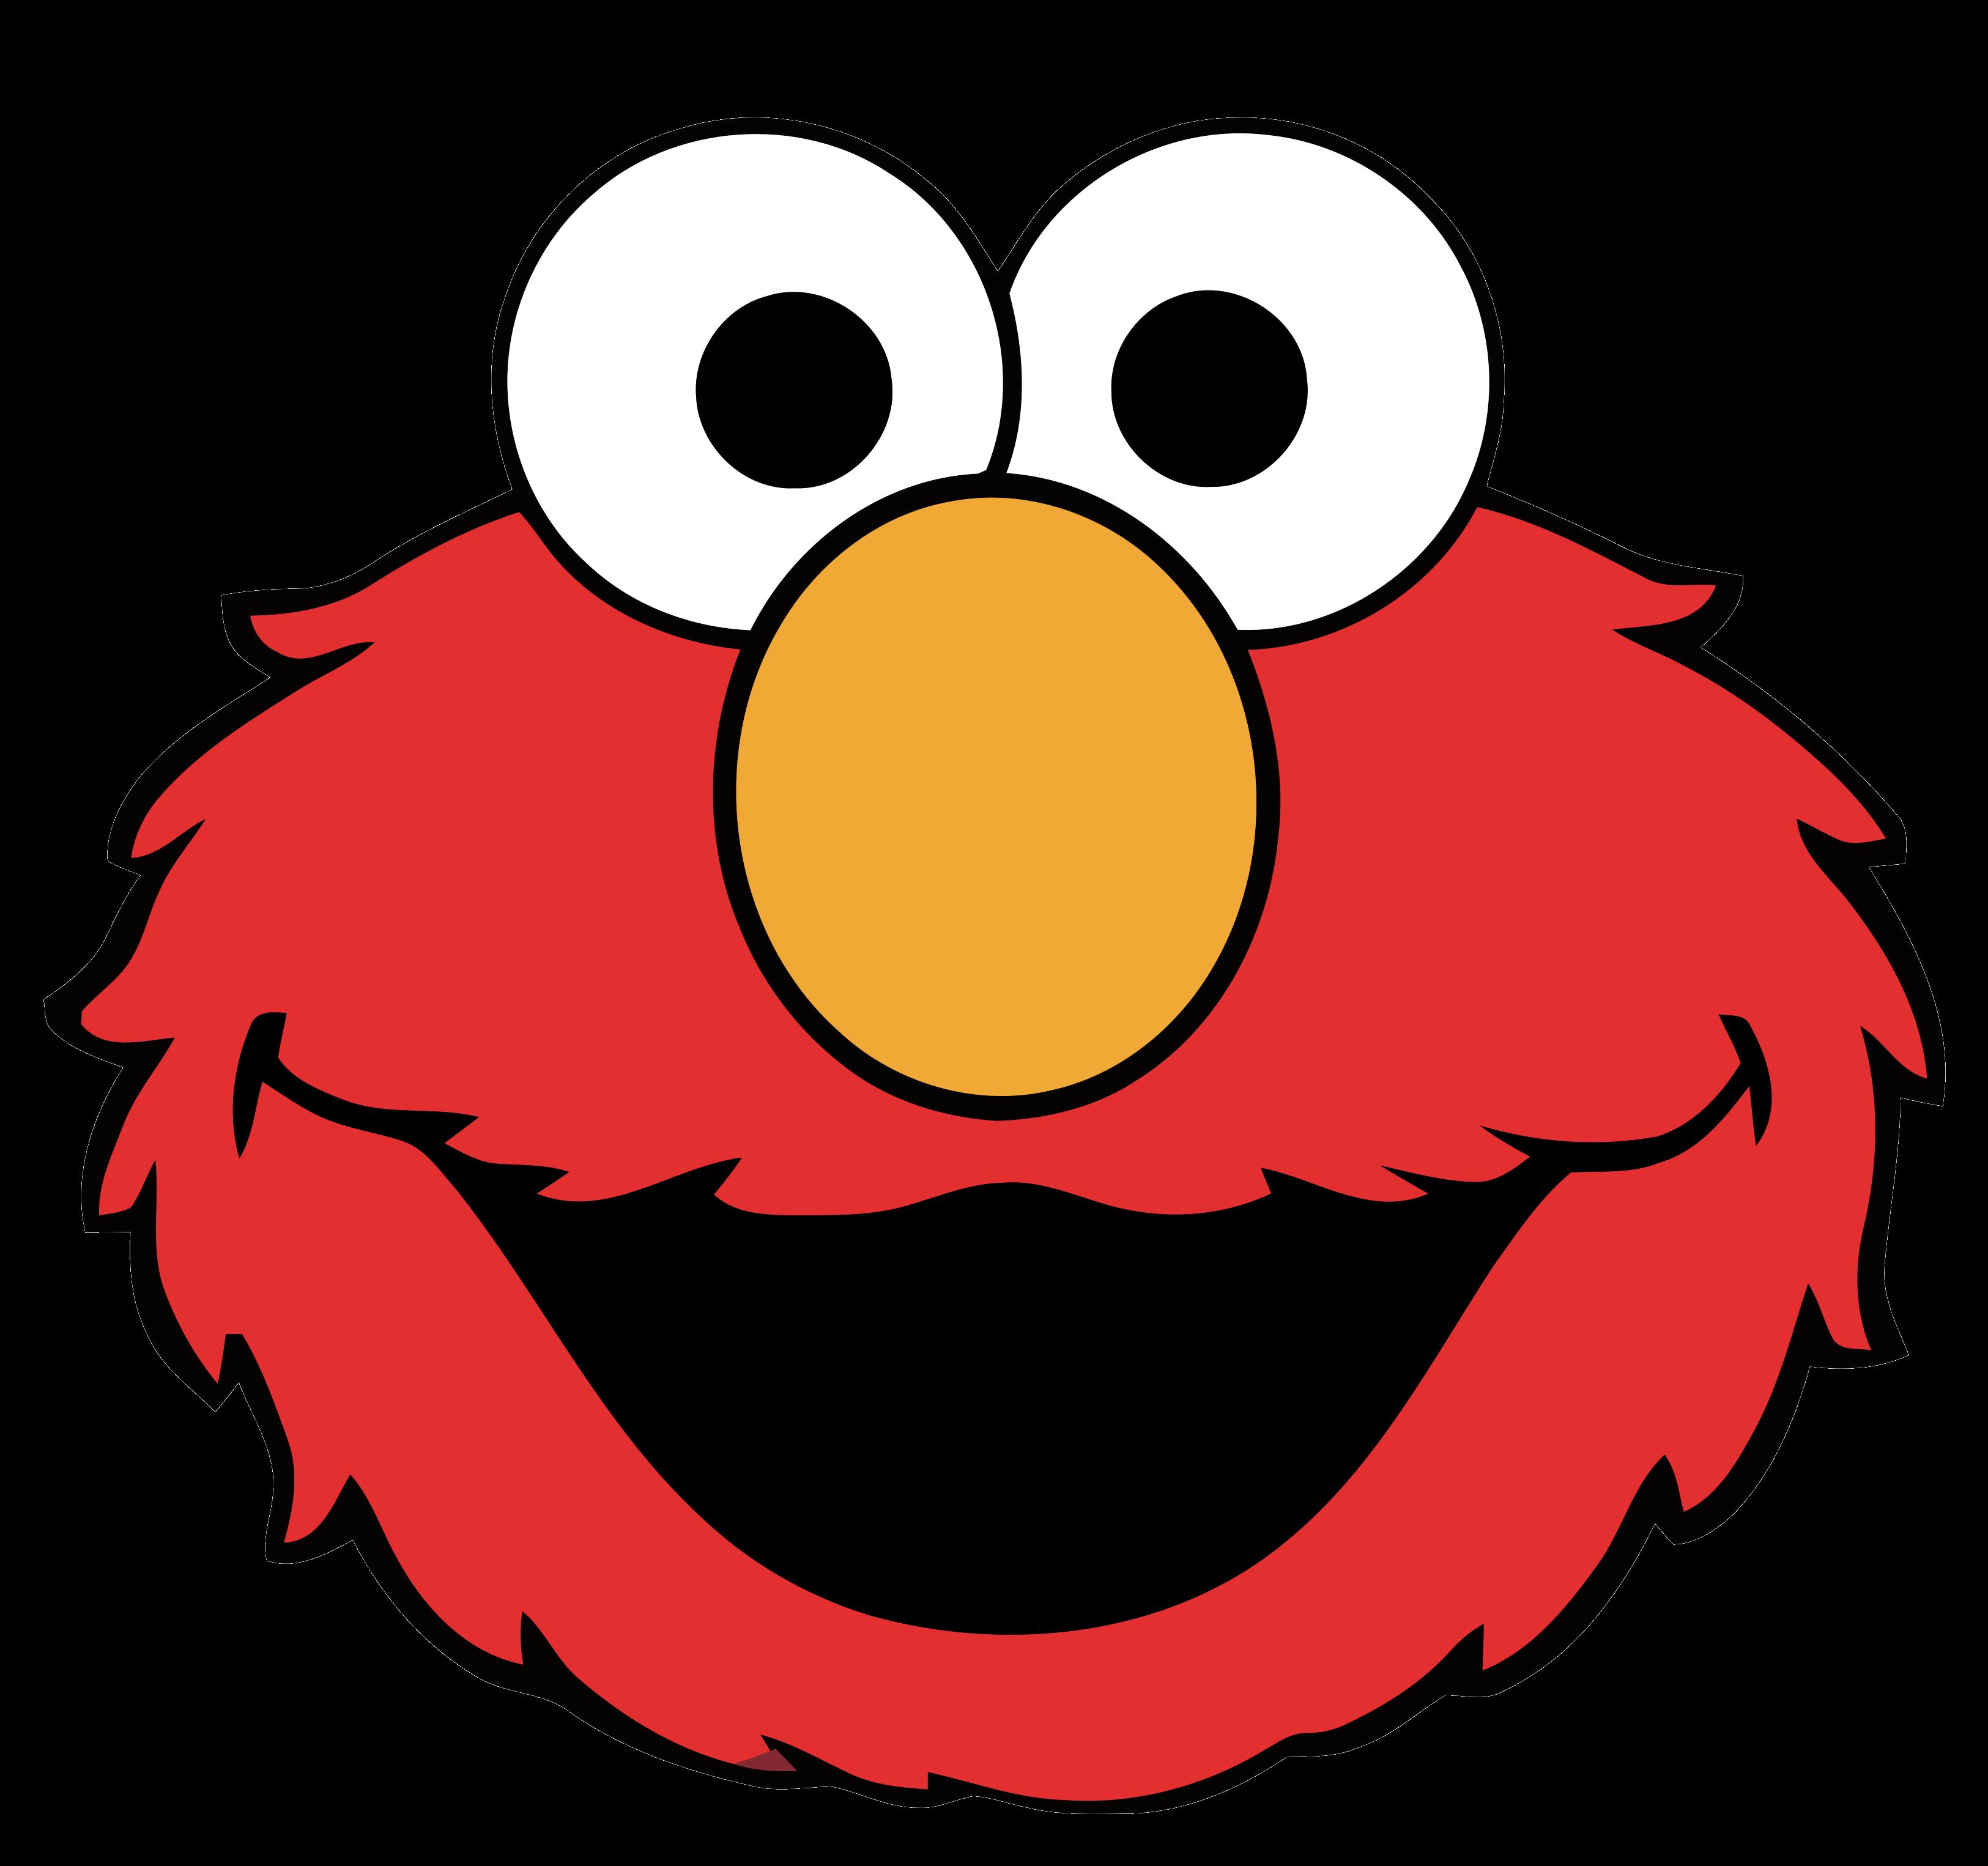 clipart library download Elmo Ernie Cookie Monster Big Bird Clip art